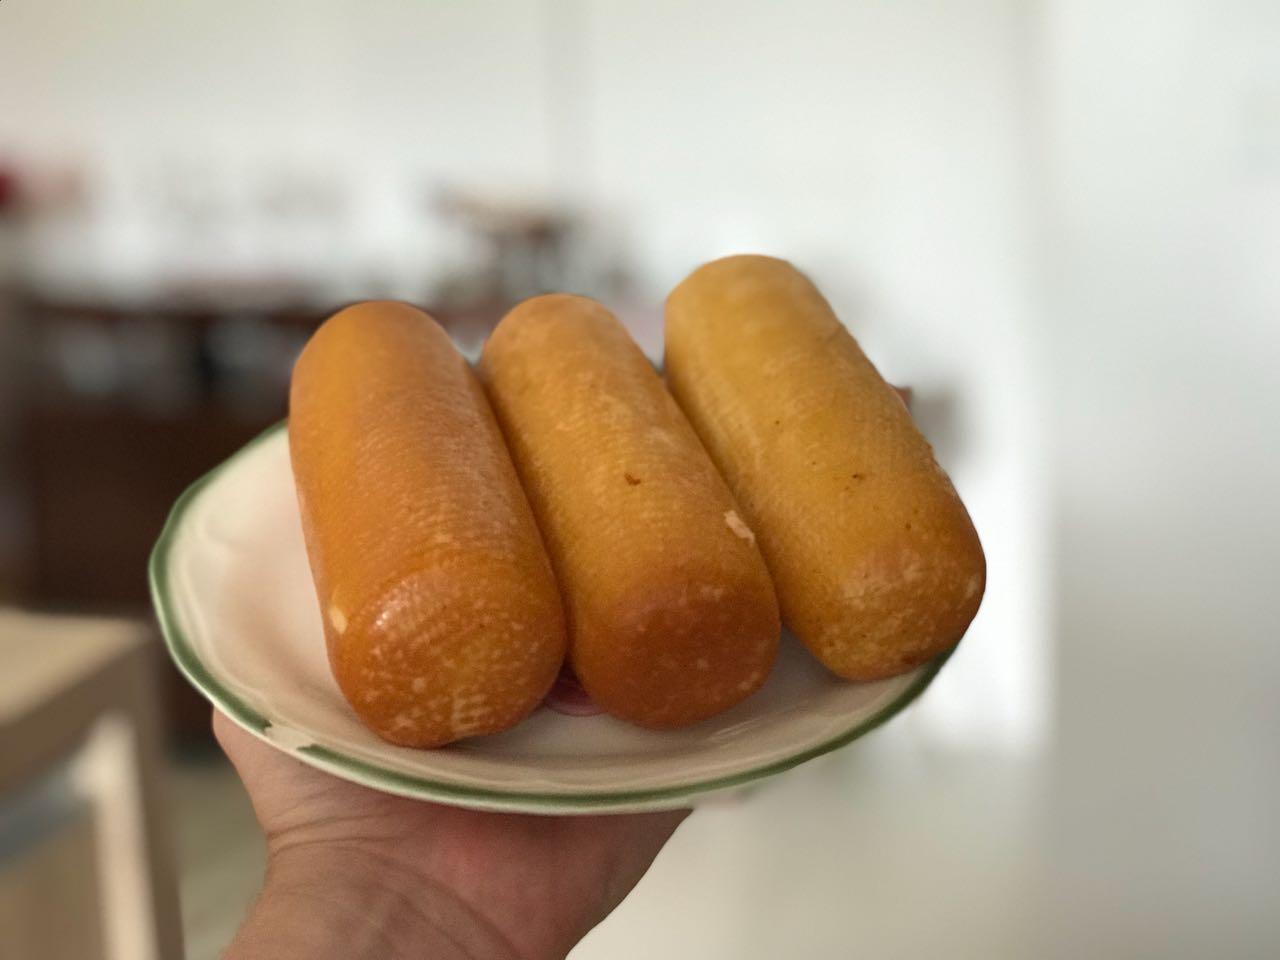 snack low carb provolone desidratado (1)